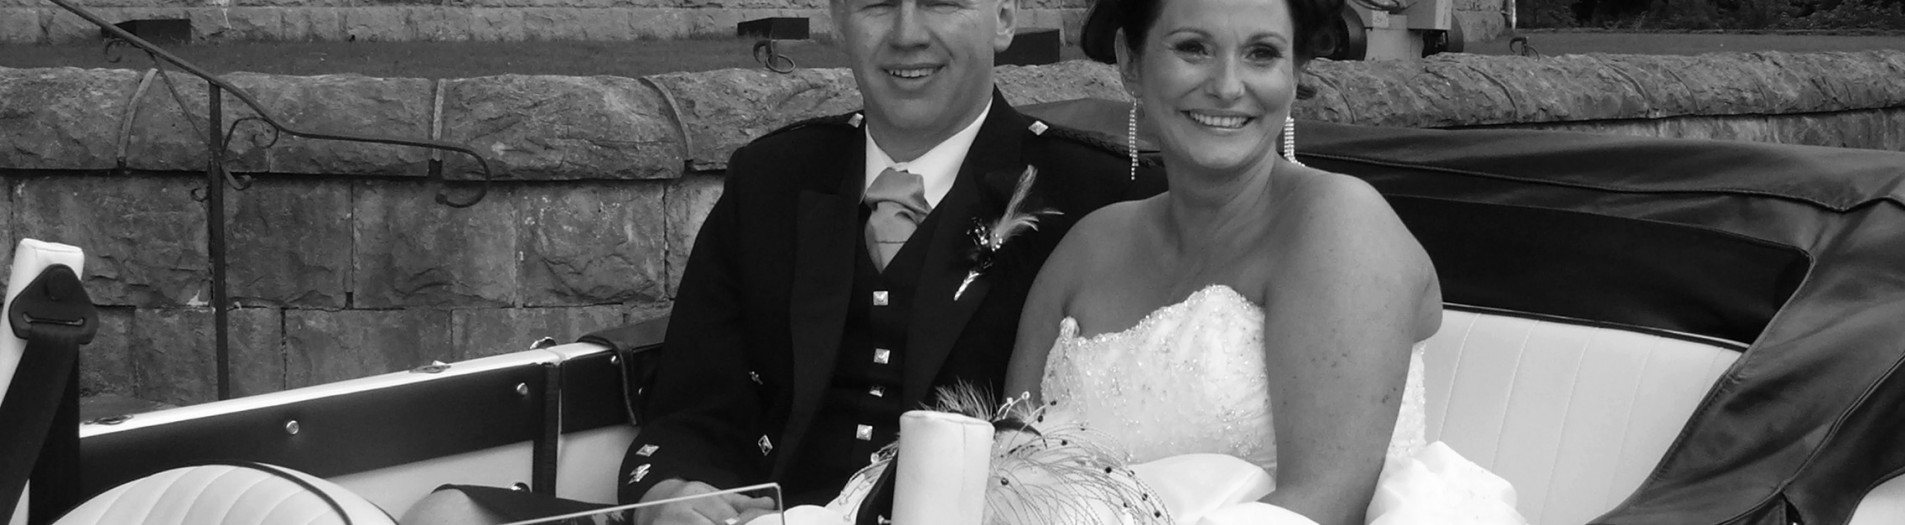 Annamarie & Ian's Wedding Day